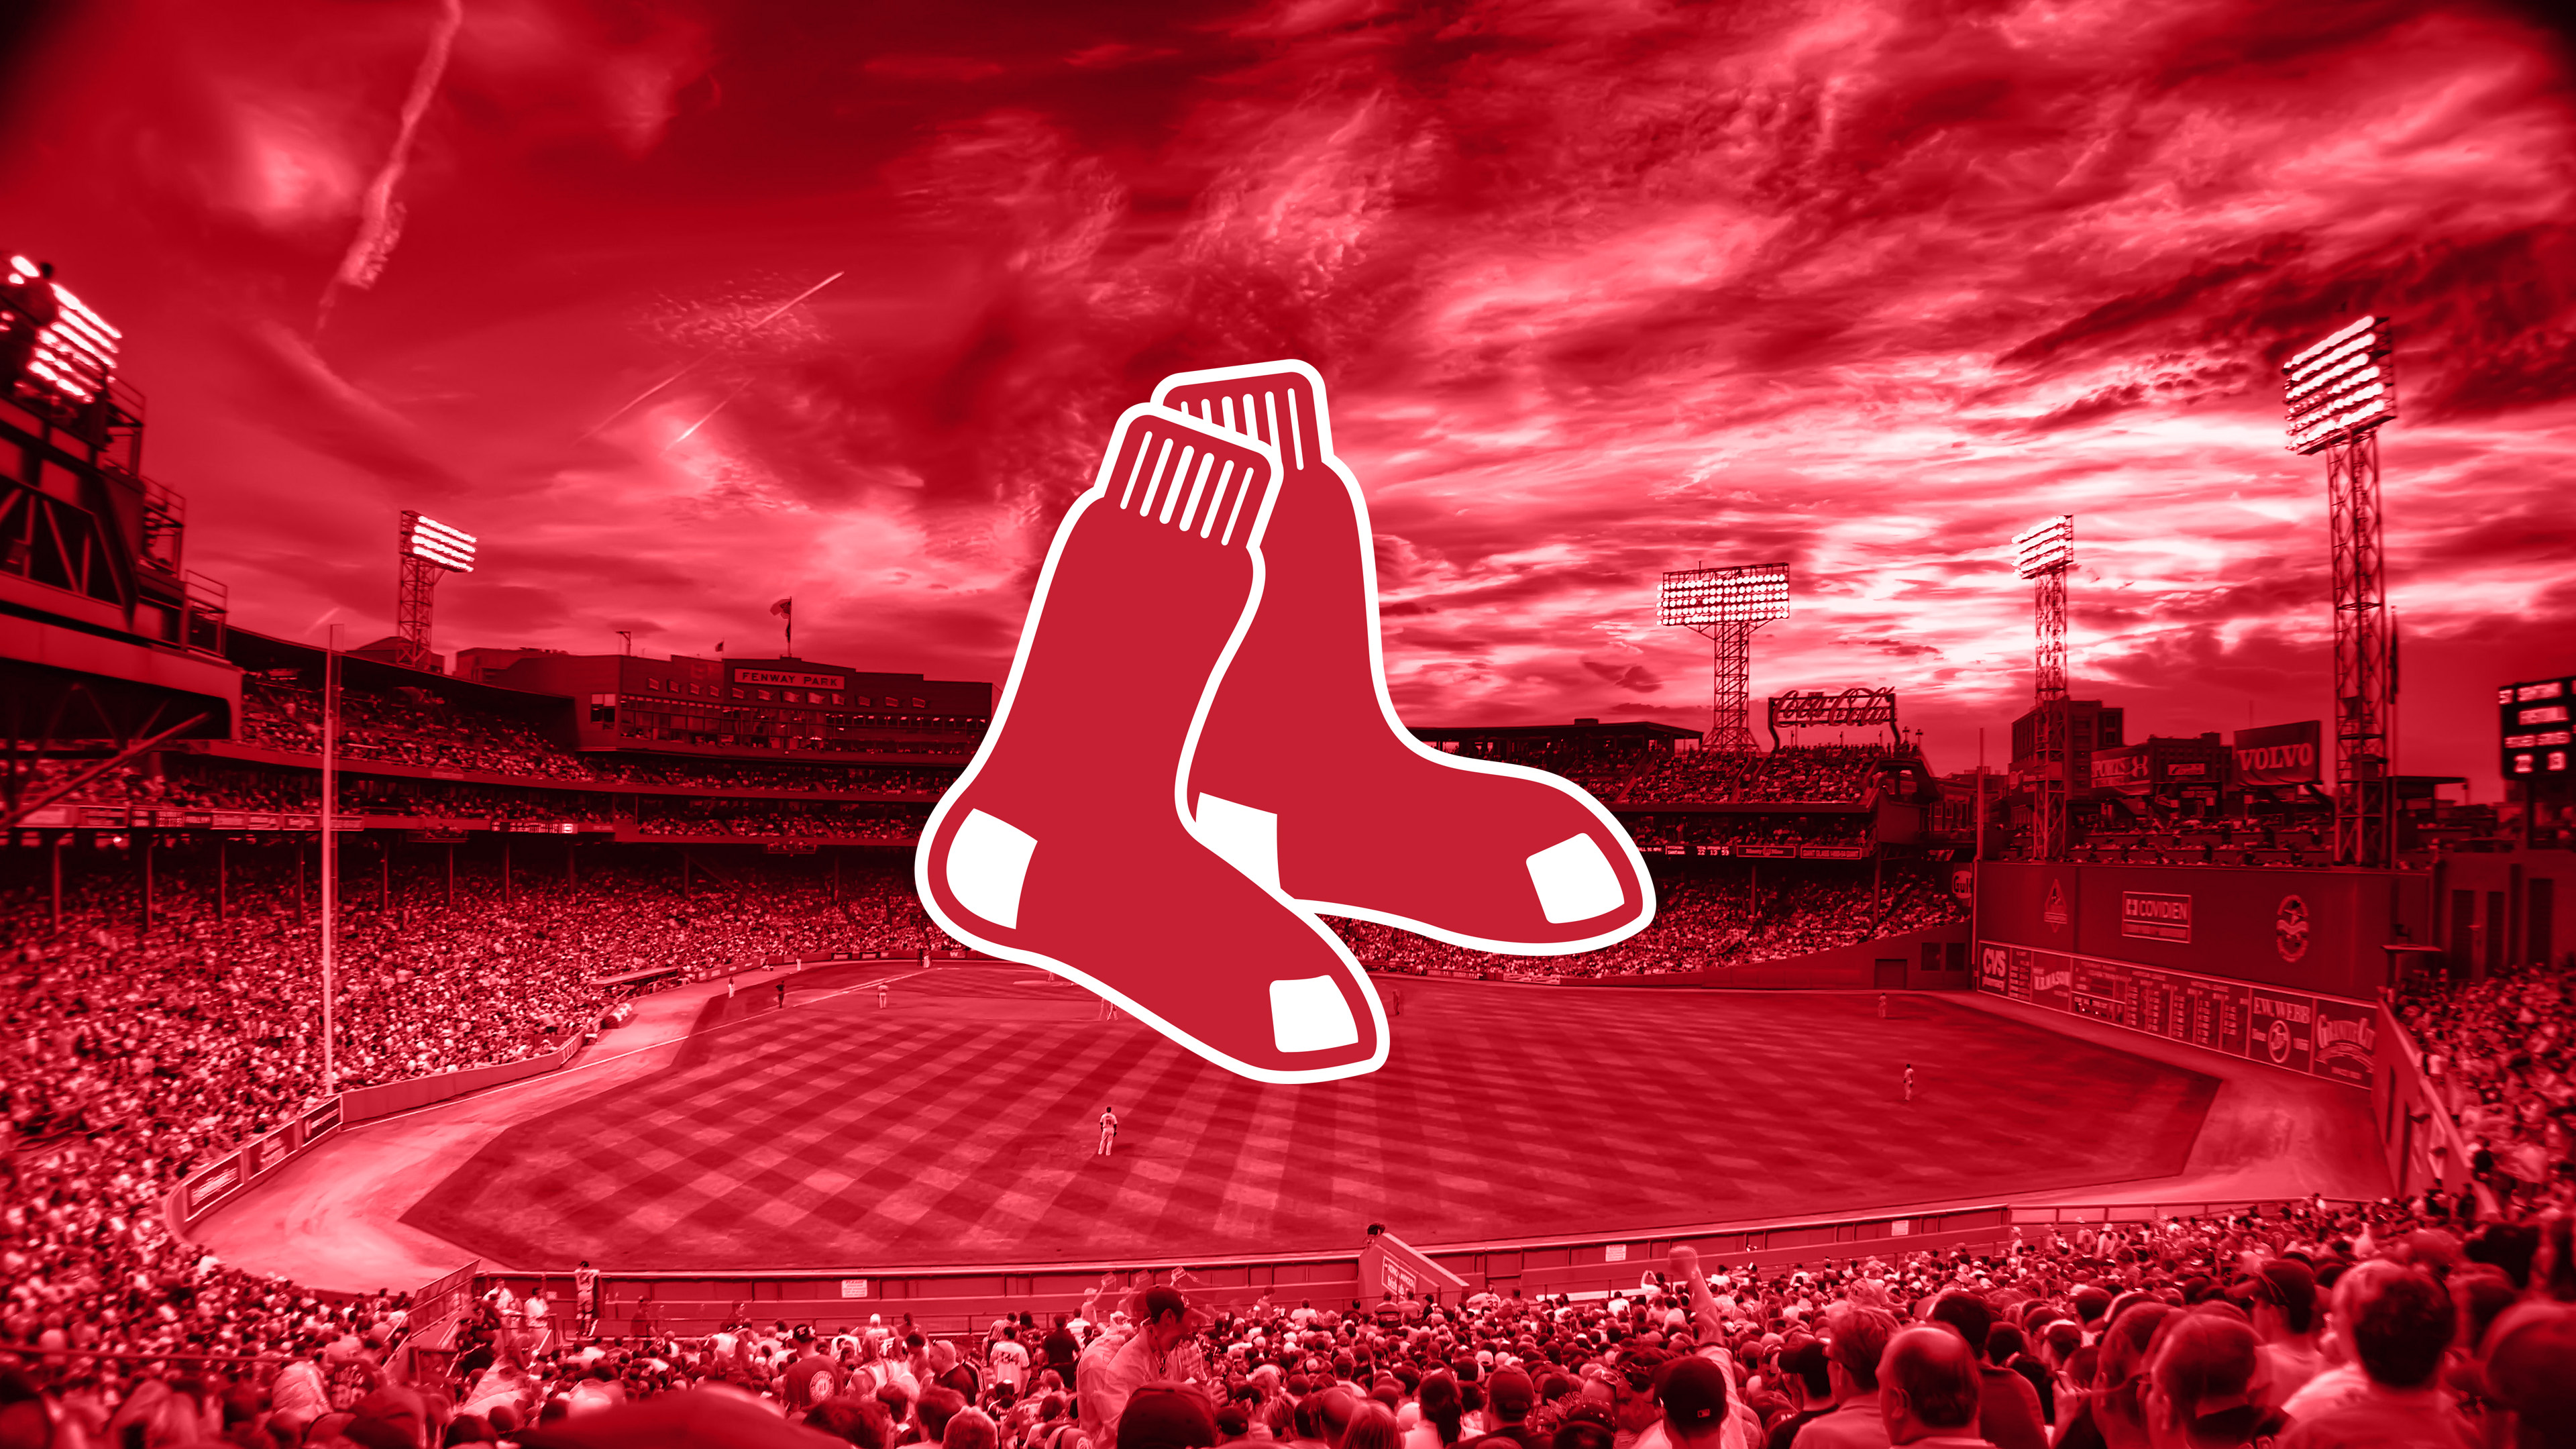 MLB Boston Red Sox 2015 Logo 4K Wallpaper 3840x2160